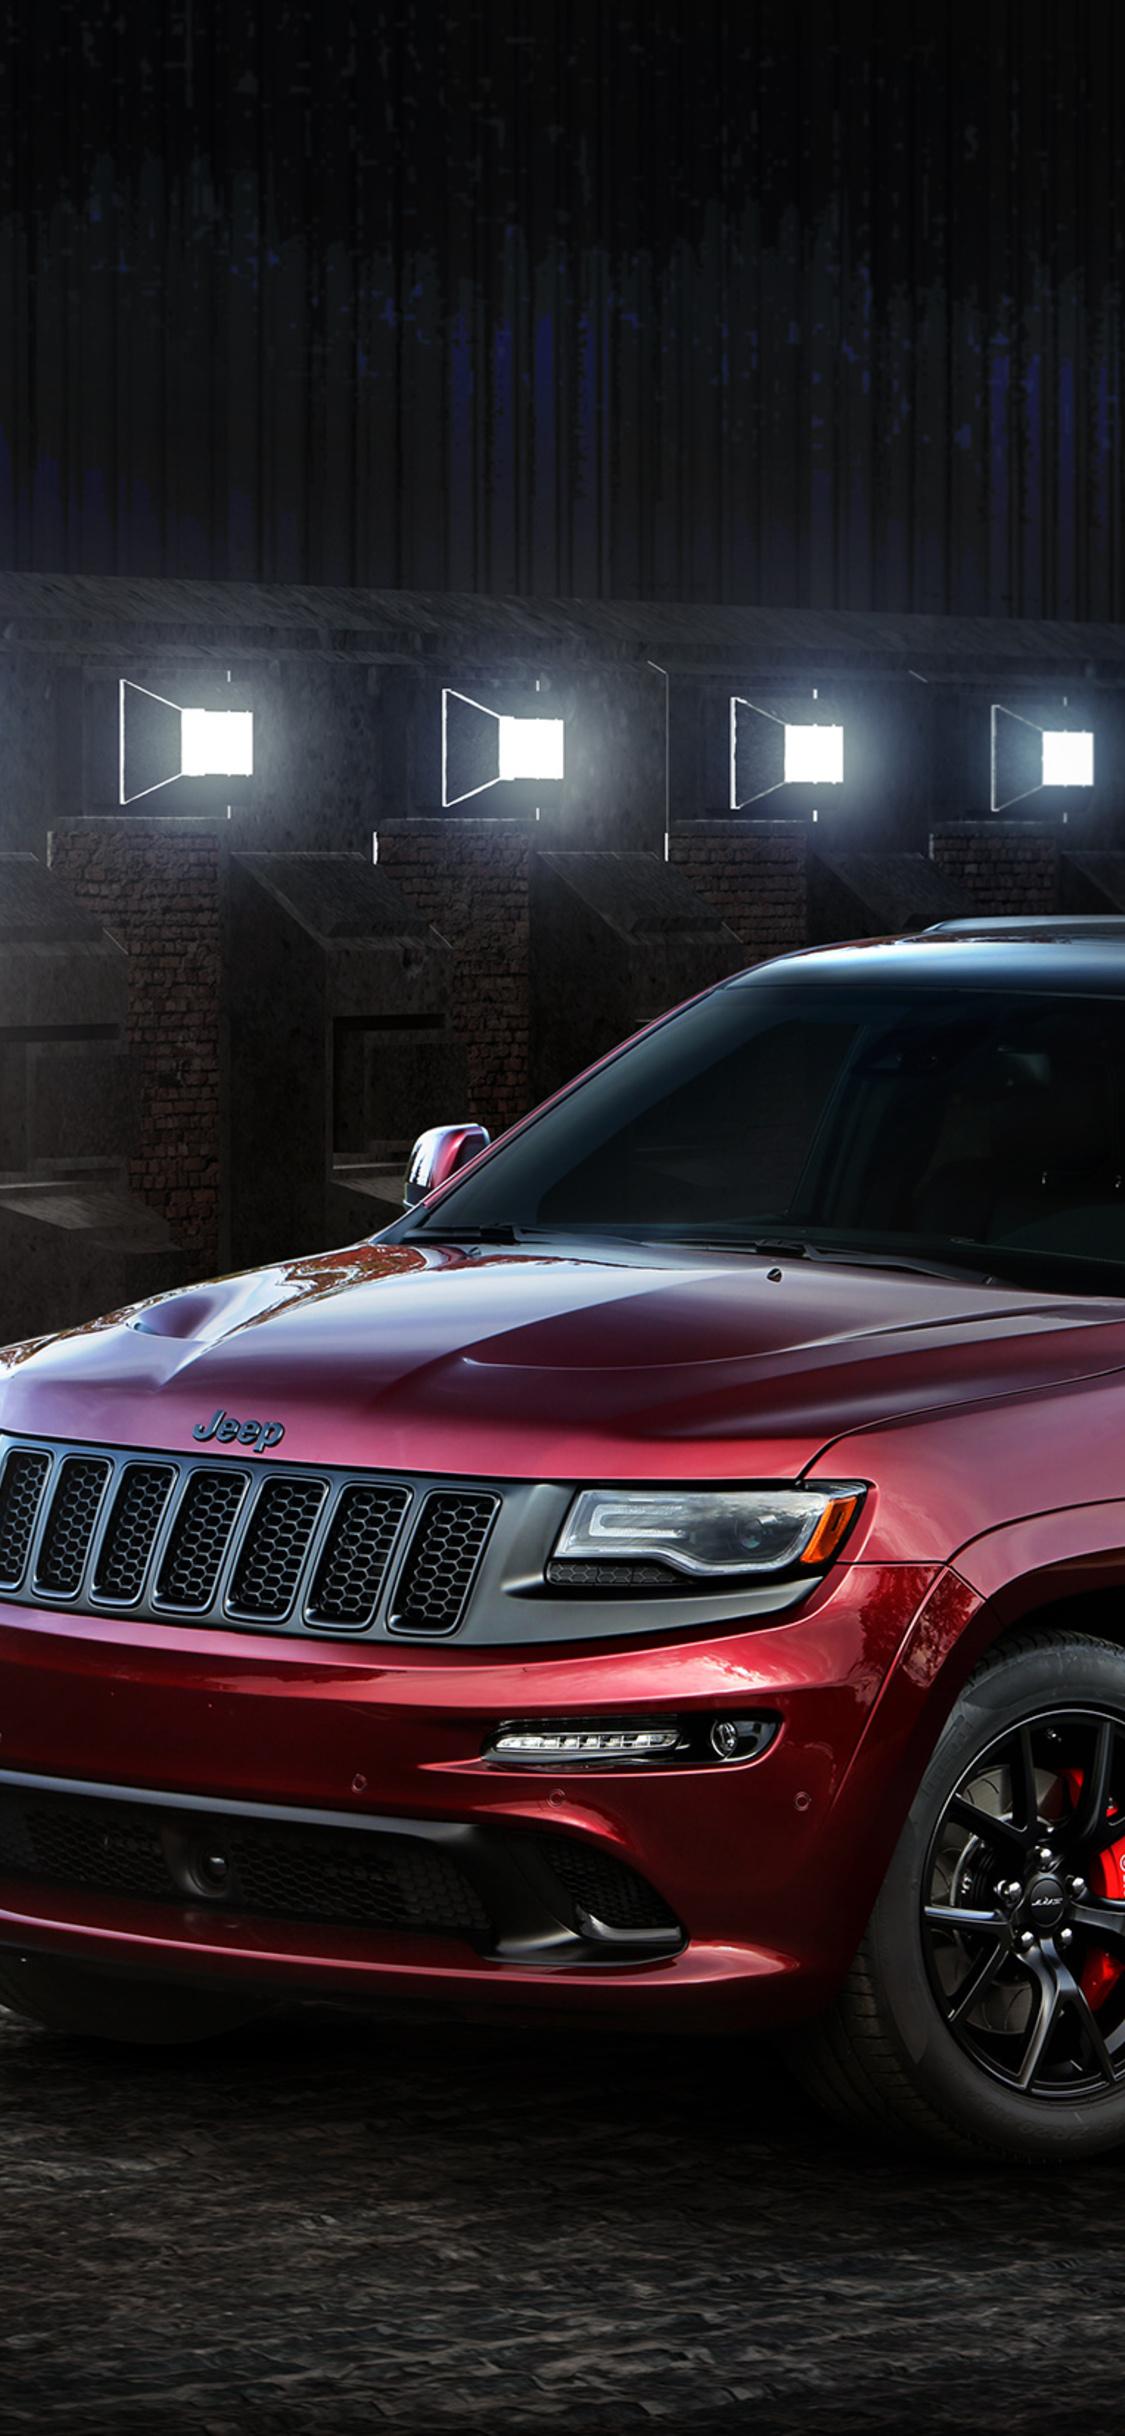 1125x2436 2017 Jeep Grand Cherokee Iphone Xs Iphone 10